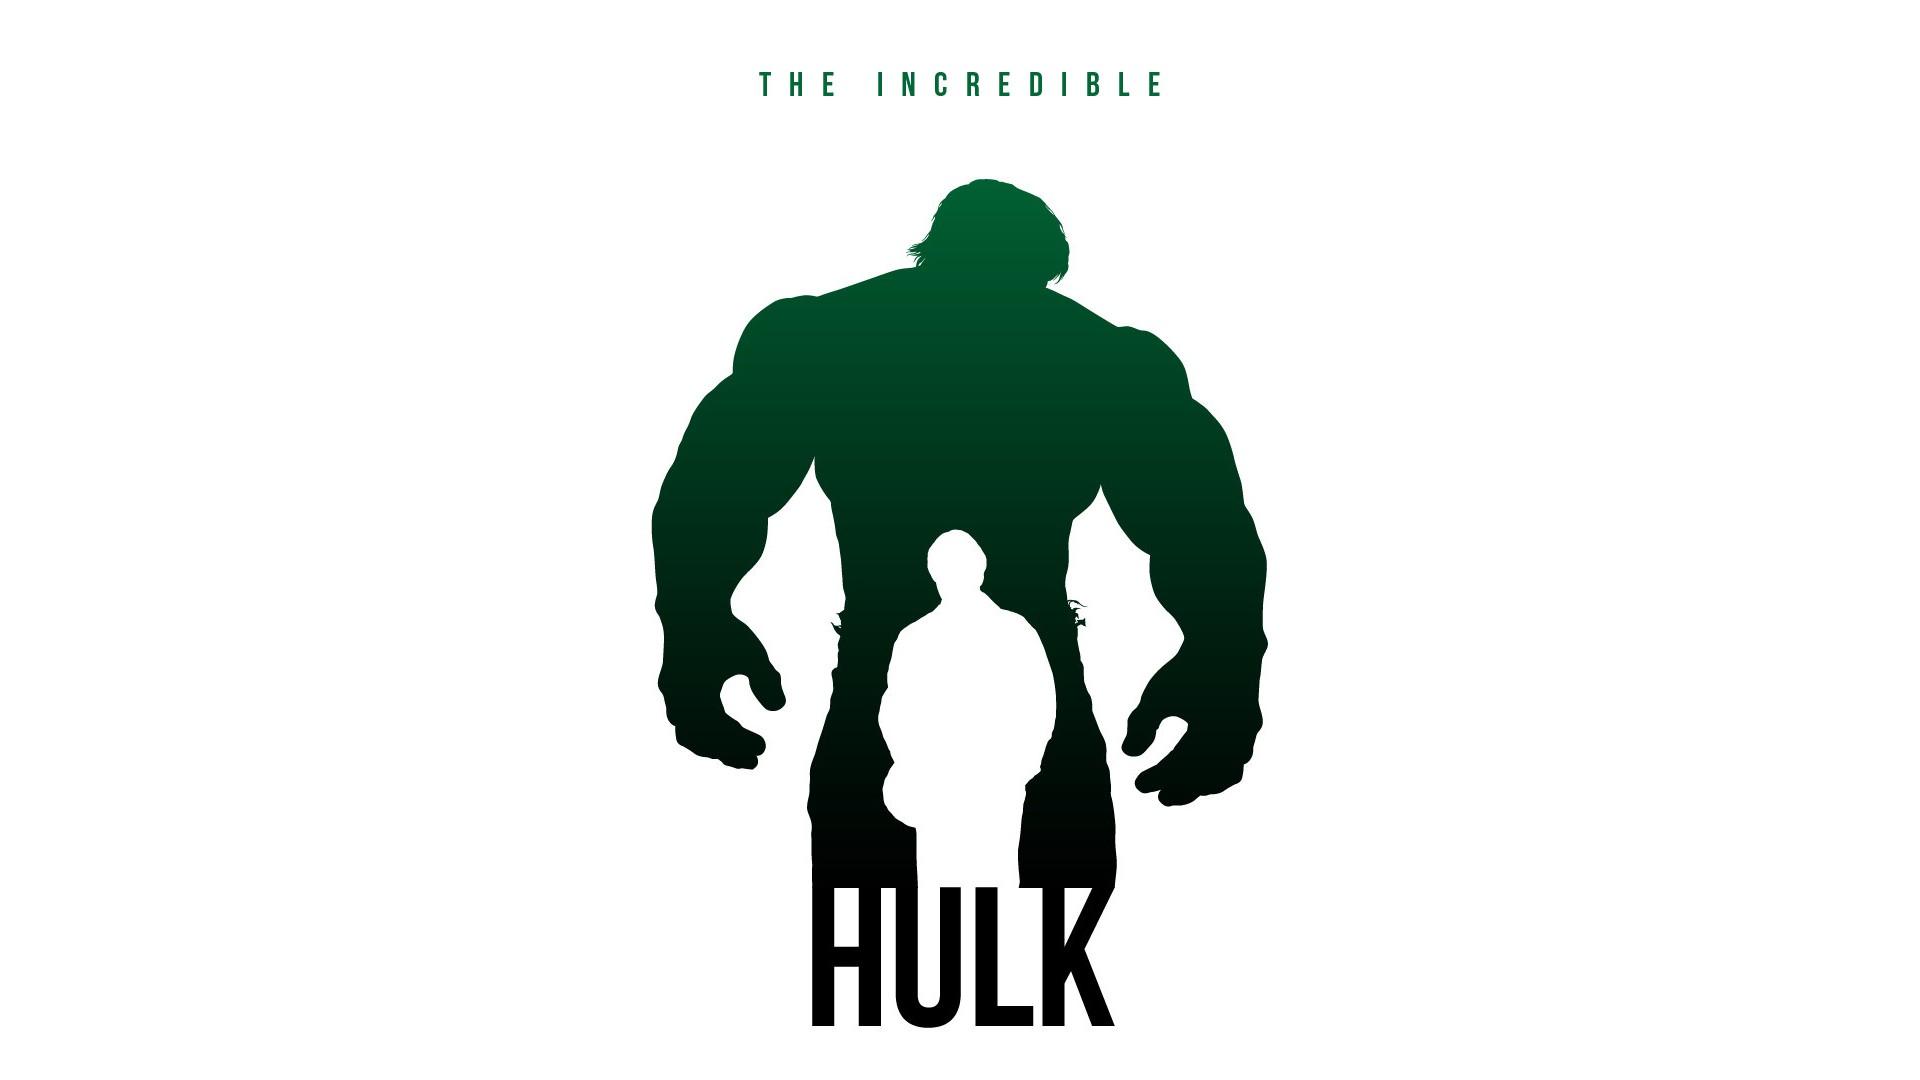 Hulk-comic-character-minimalistic-silhouette-Marvel-Comics-The-Avengers-posters-fan-art-white-back-wallpaper-wpc5806137